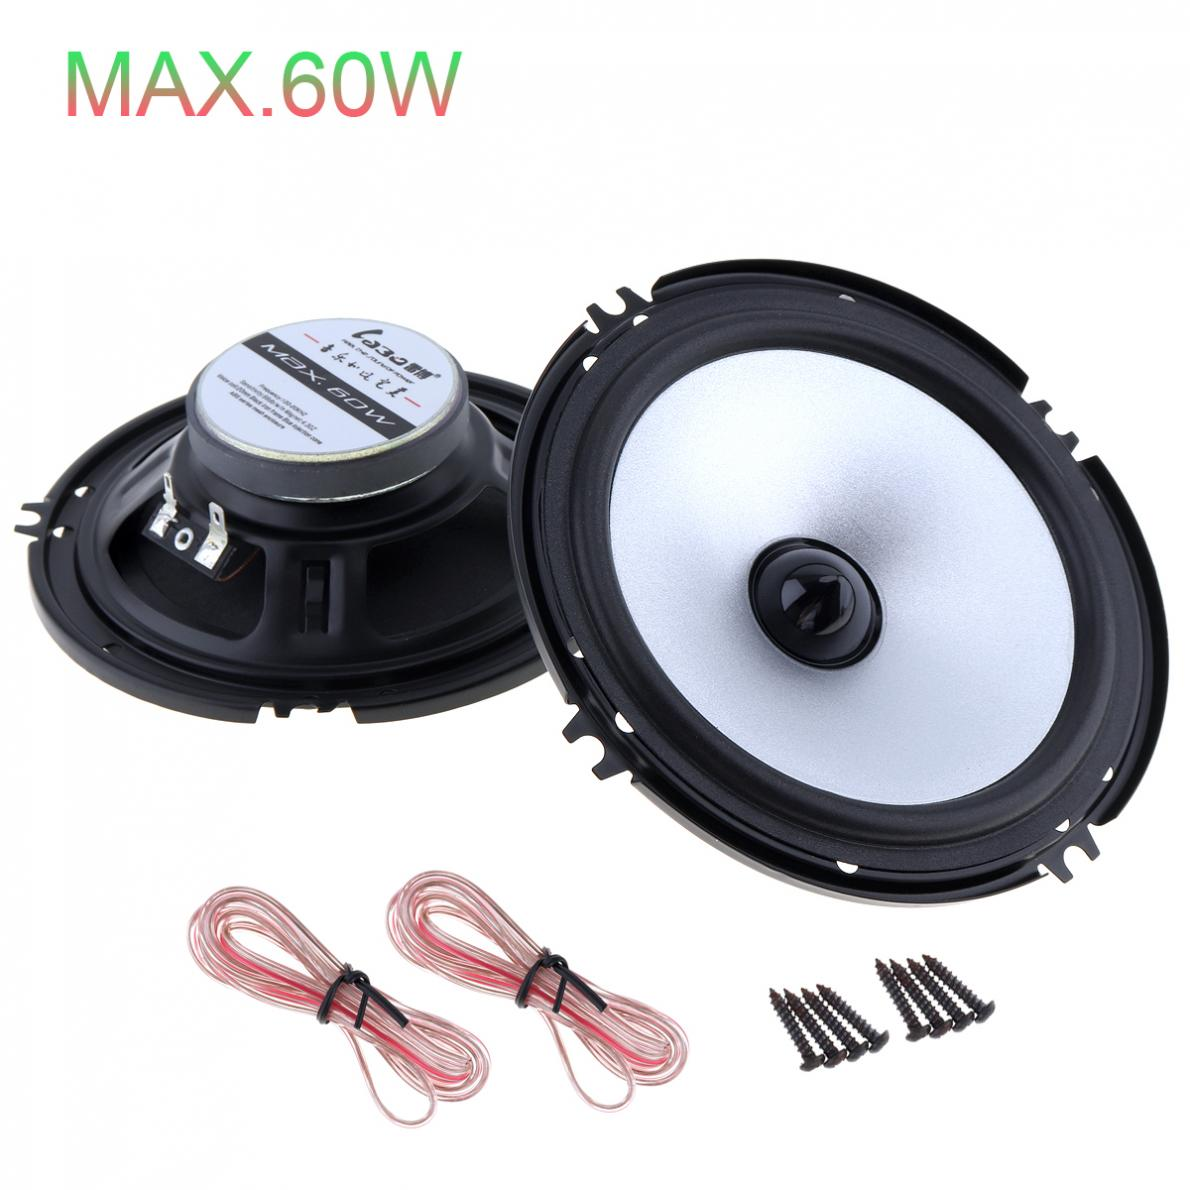 2 pcs! 6.5 Inch 60W Auto Car Speaker Automobile Car HiFi Audio Full Range Frequency Speaker High Pitch Loudspeaker